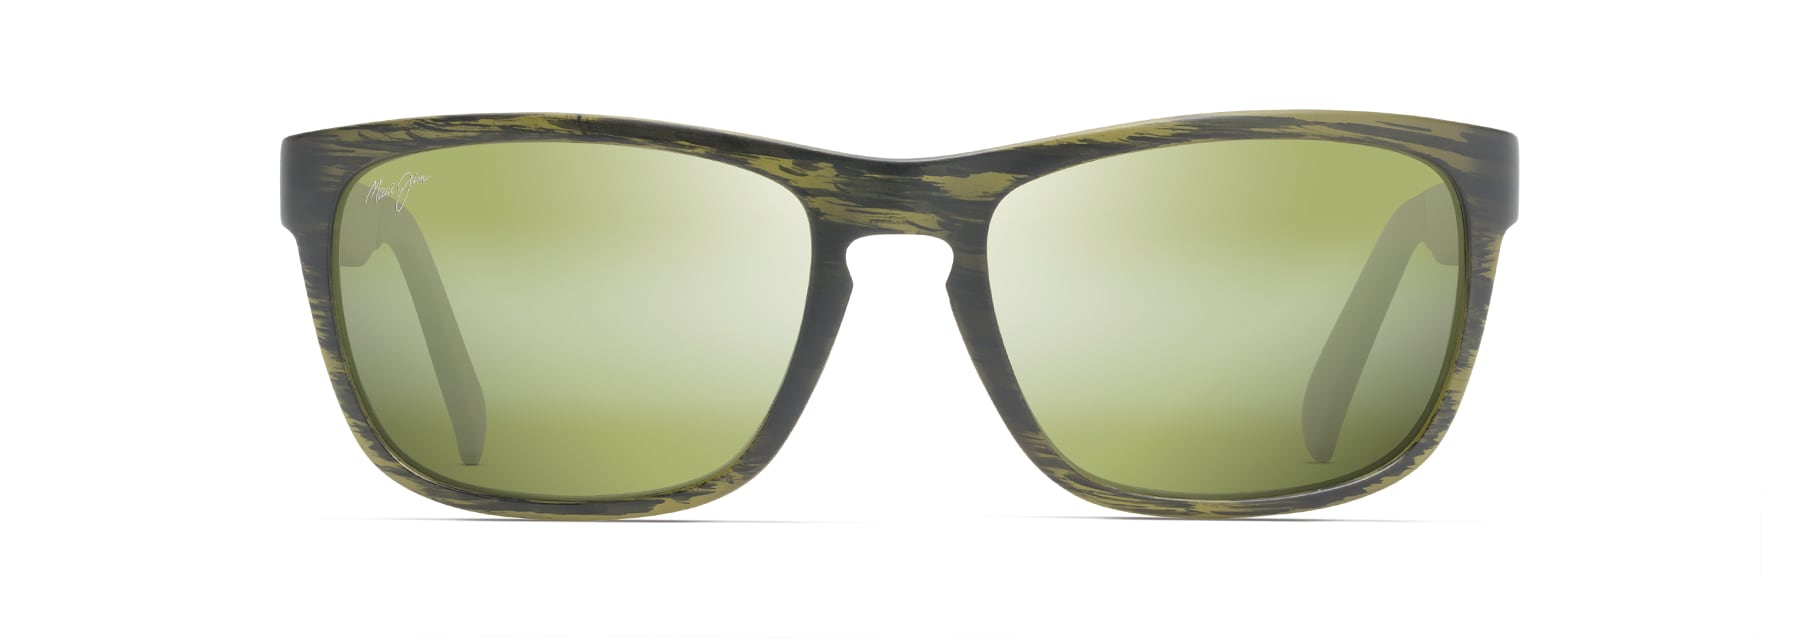 92a6b92f6b South Swell Polarised Sunglasses